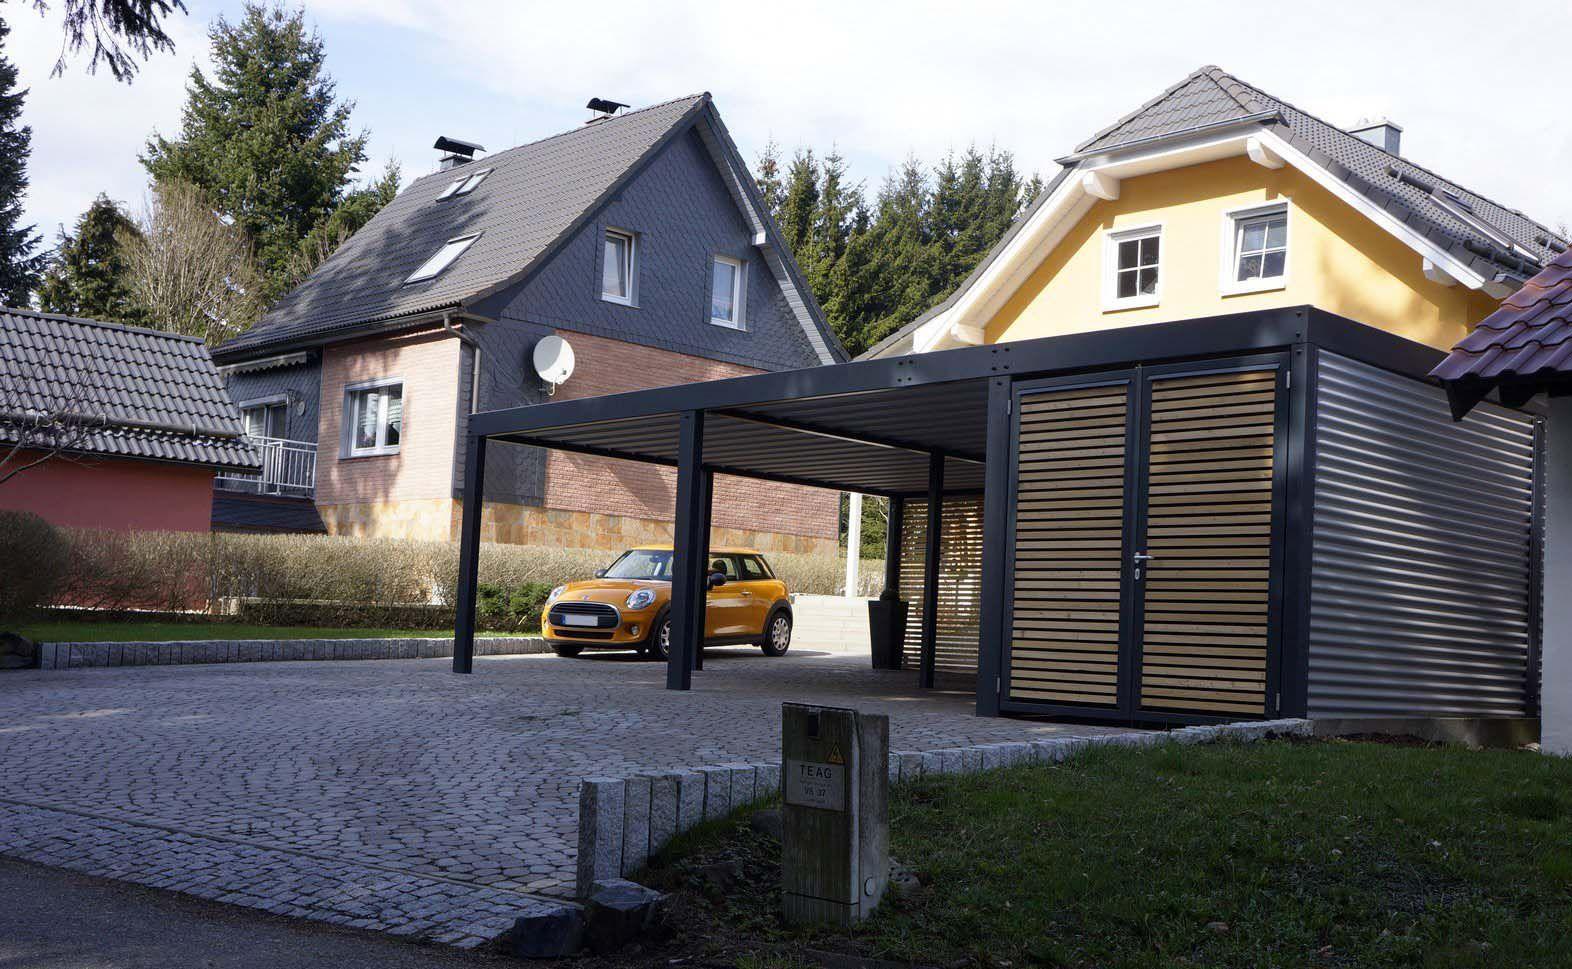 Design Metall Carport aus Stahl Holz mit Abstellraum Wien ster  Metallcarport Doppelcarport